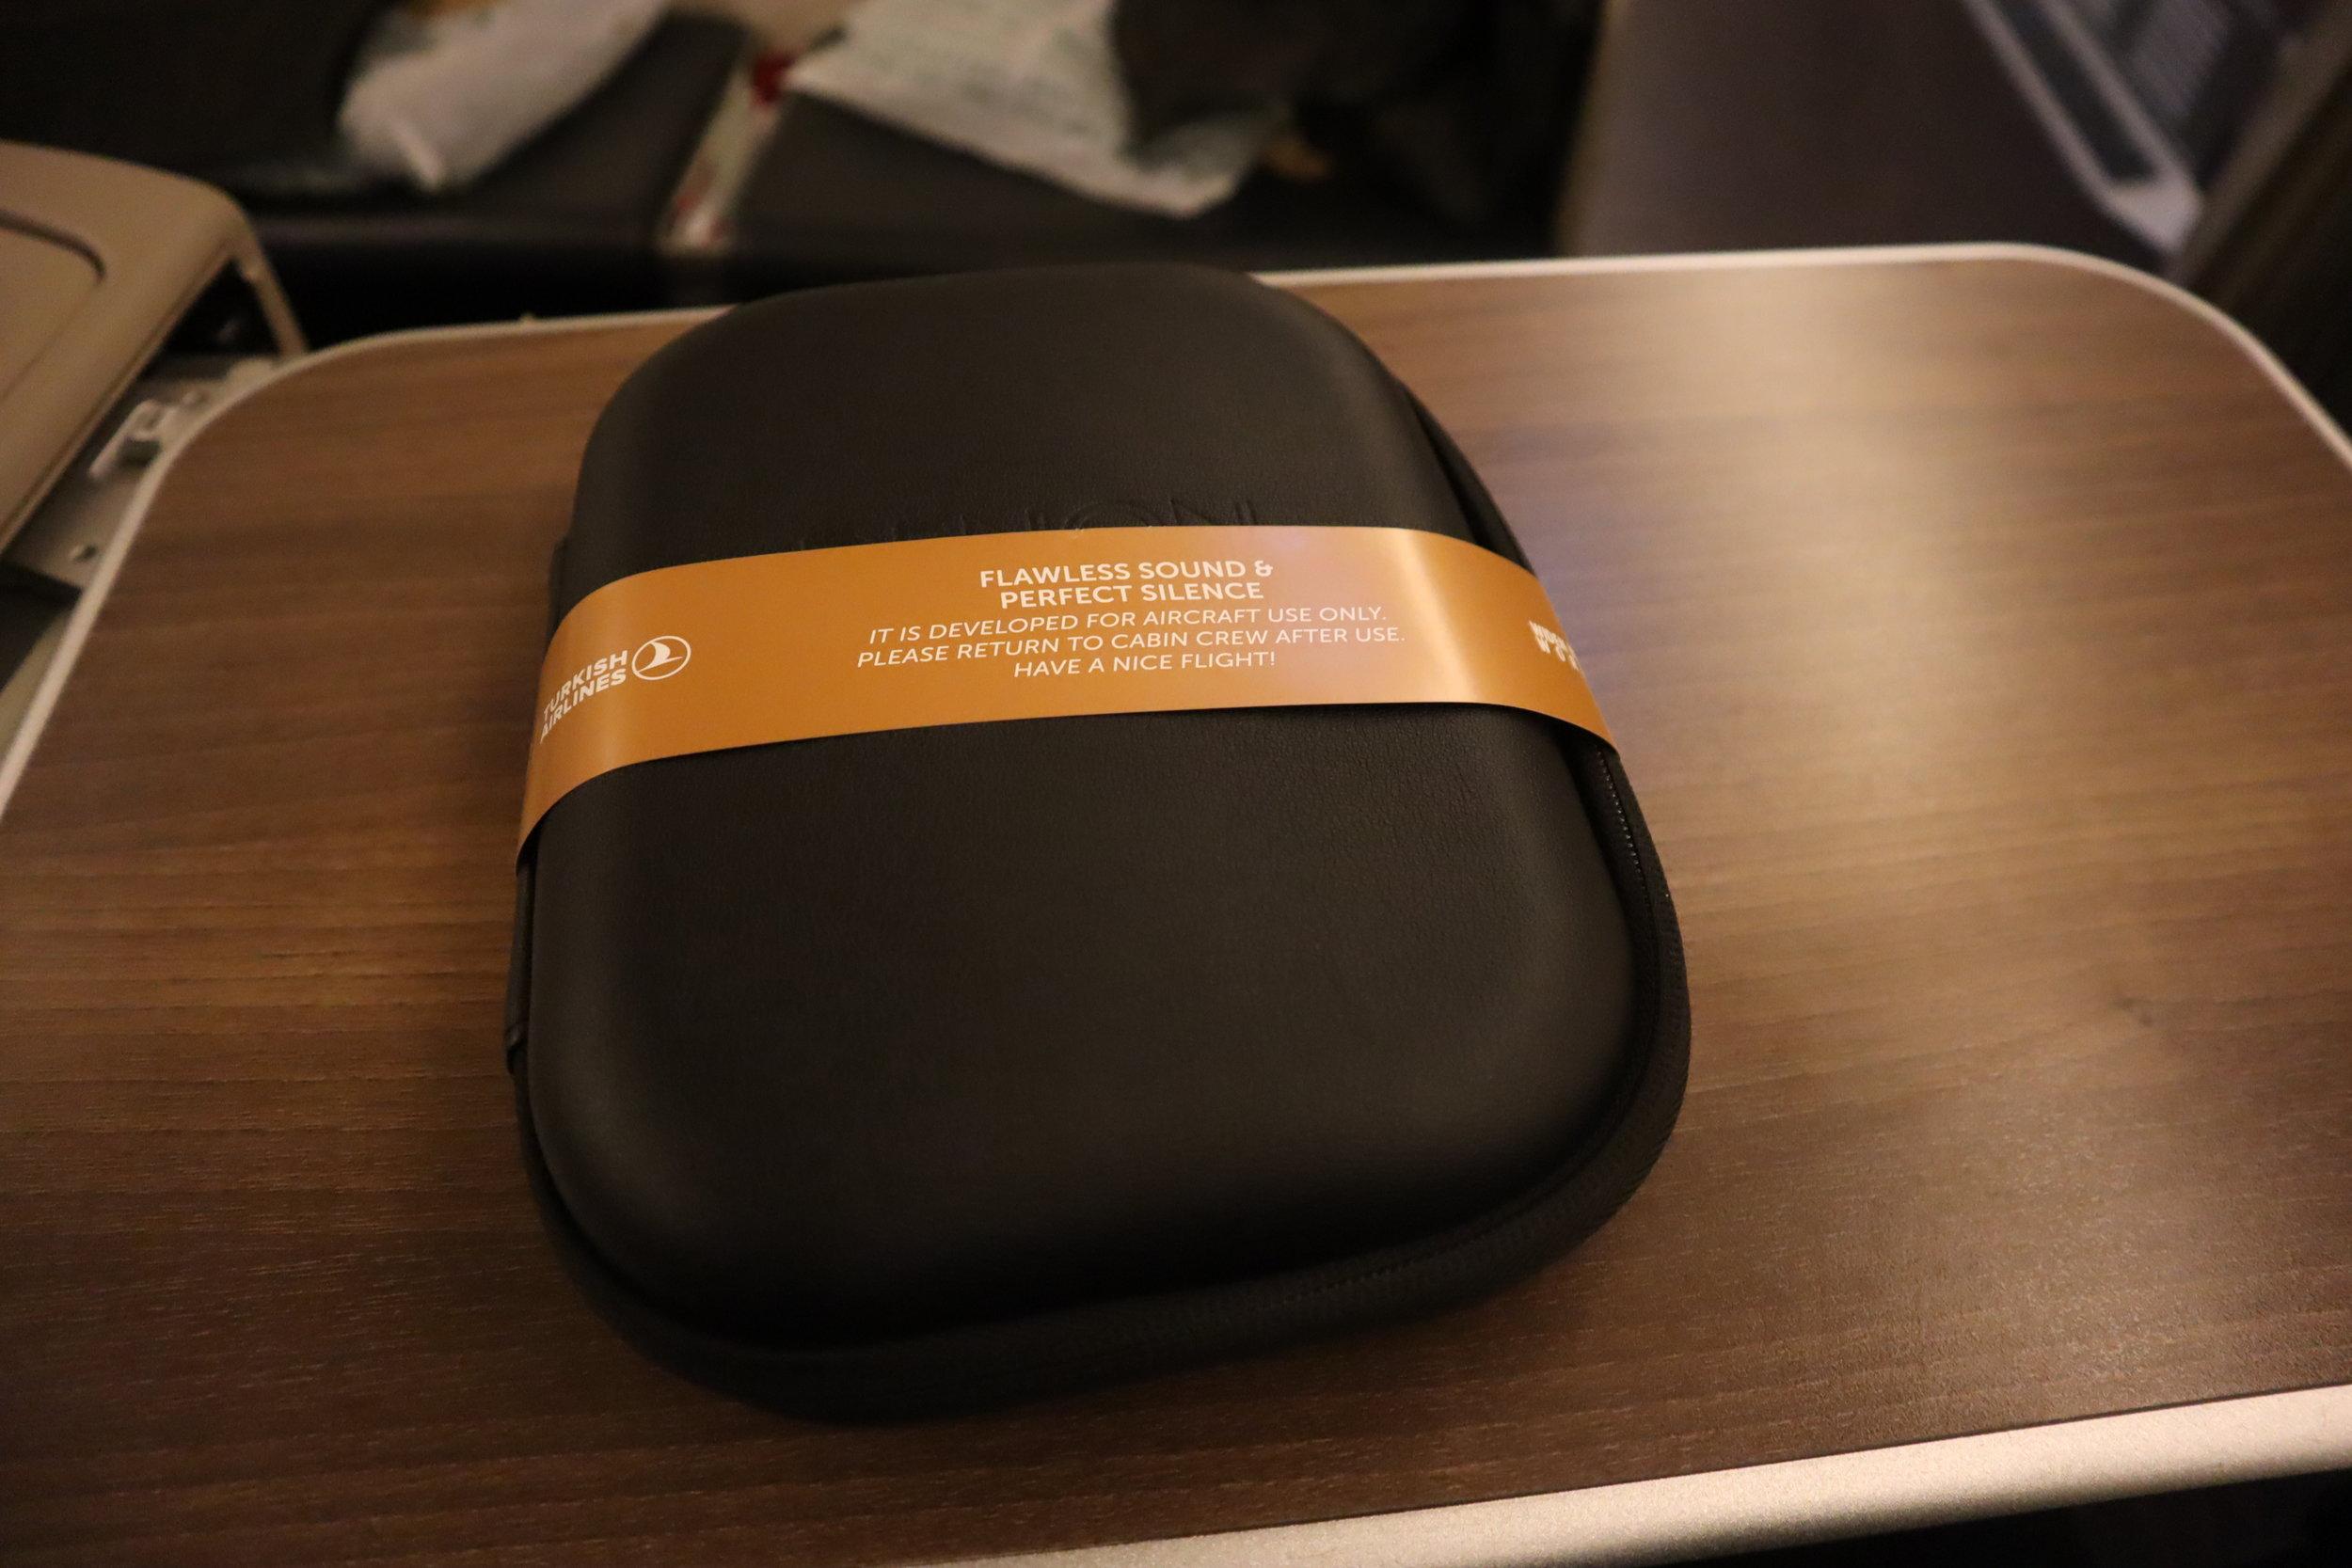 Turkish Airlines 777 business class – Headphones